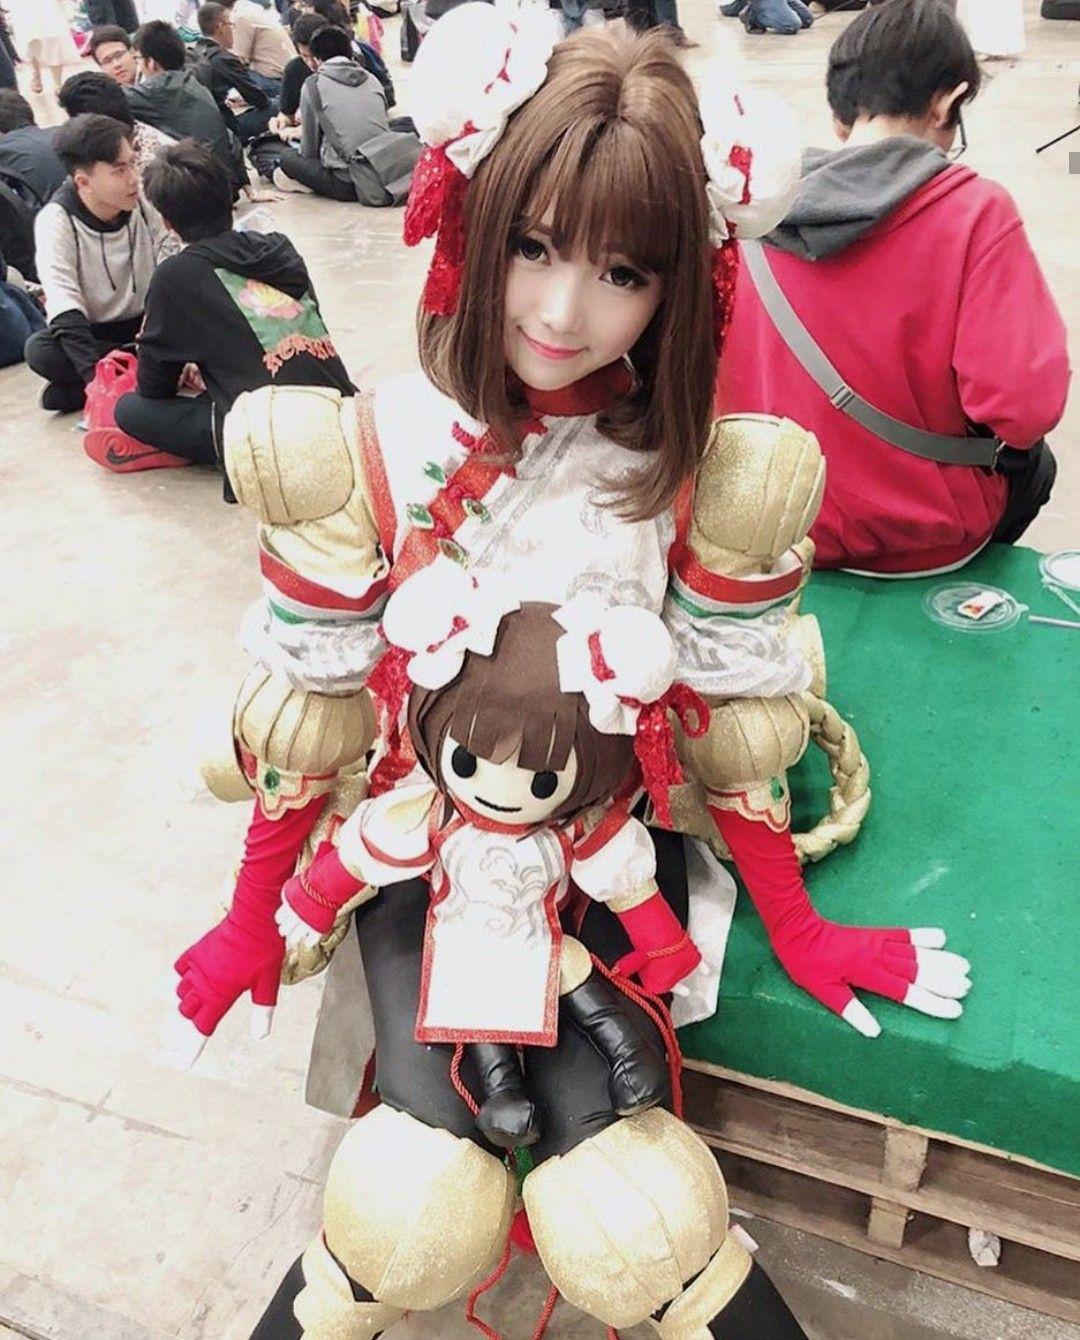 Mobile Legends Angela cosplay | Gadis manga, Gambar, Manga